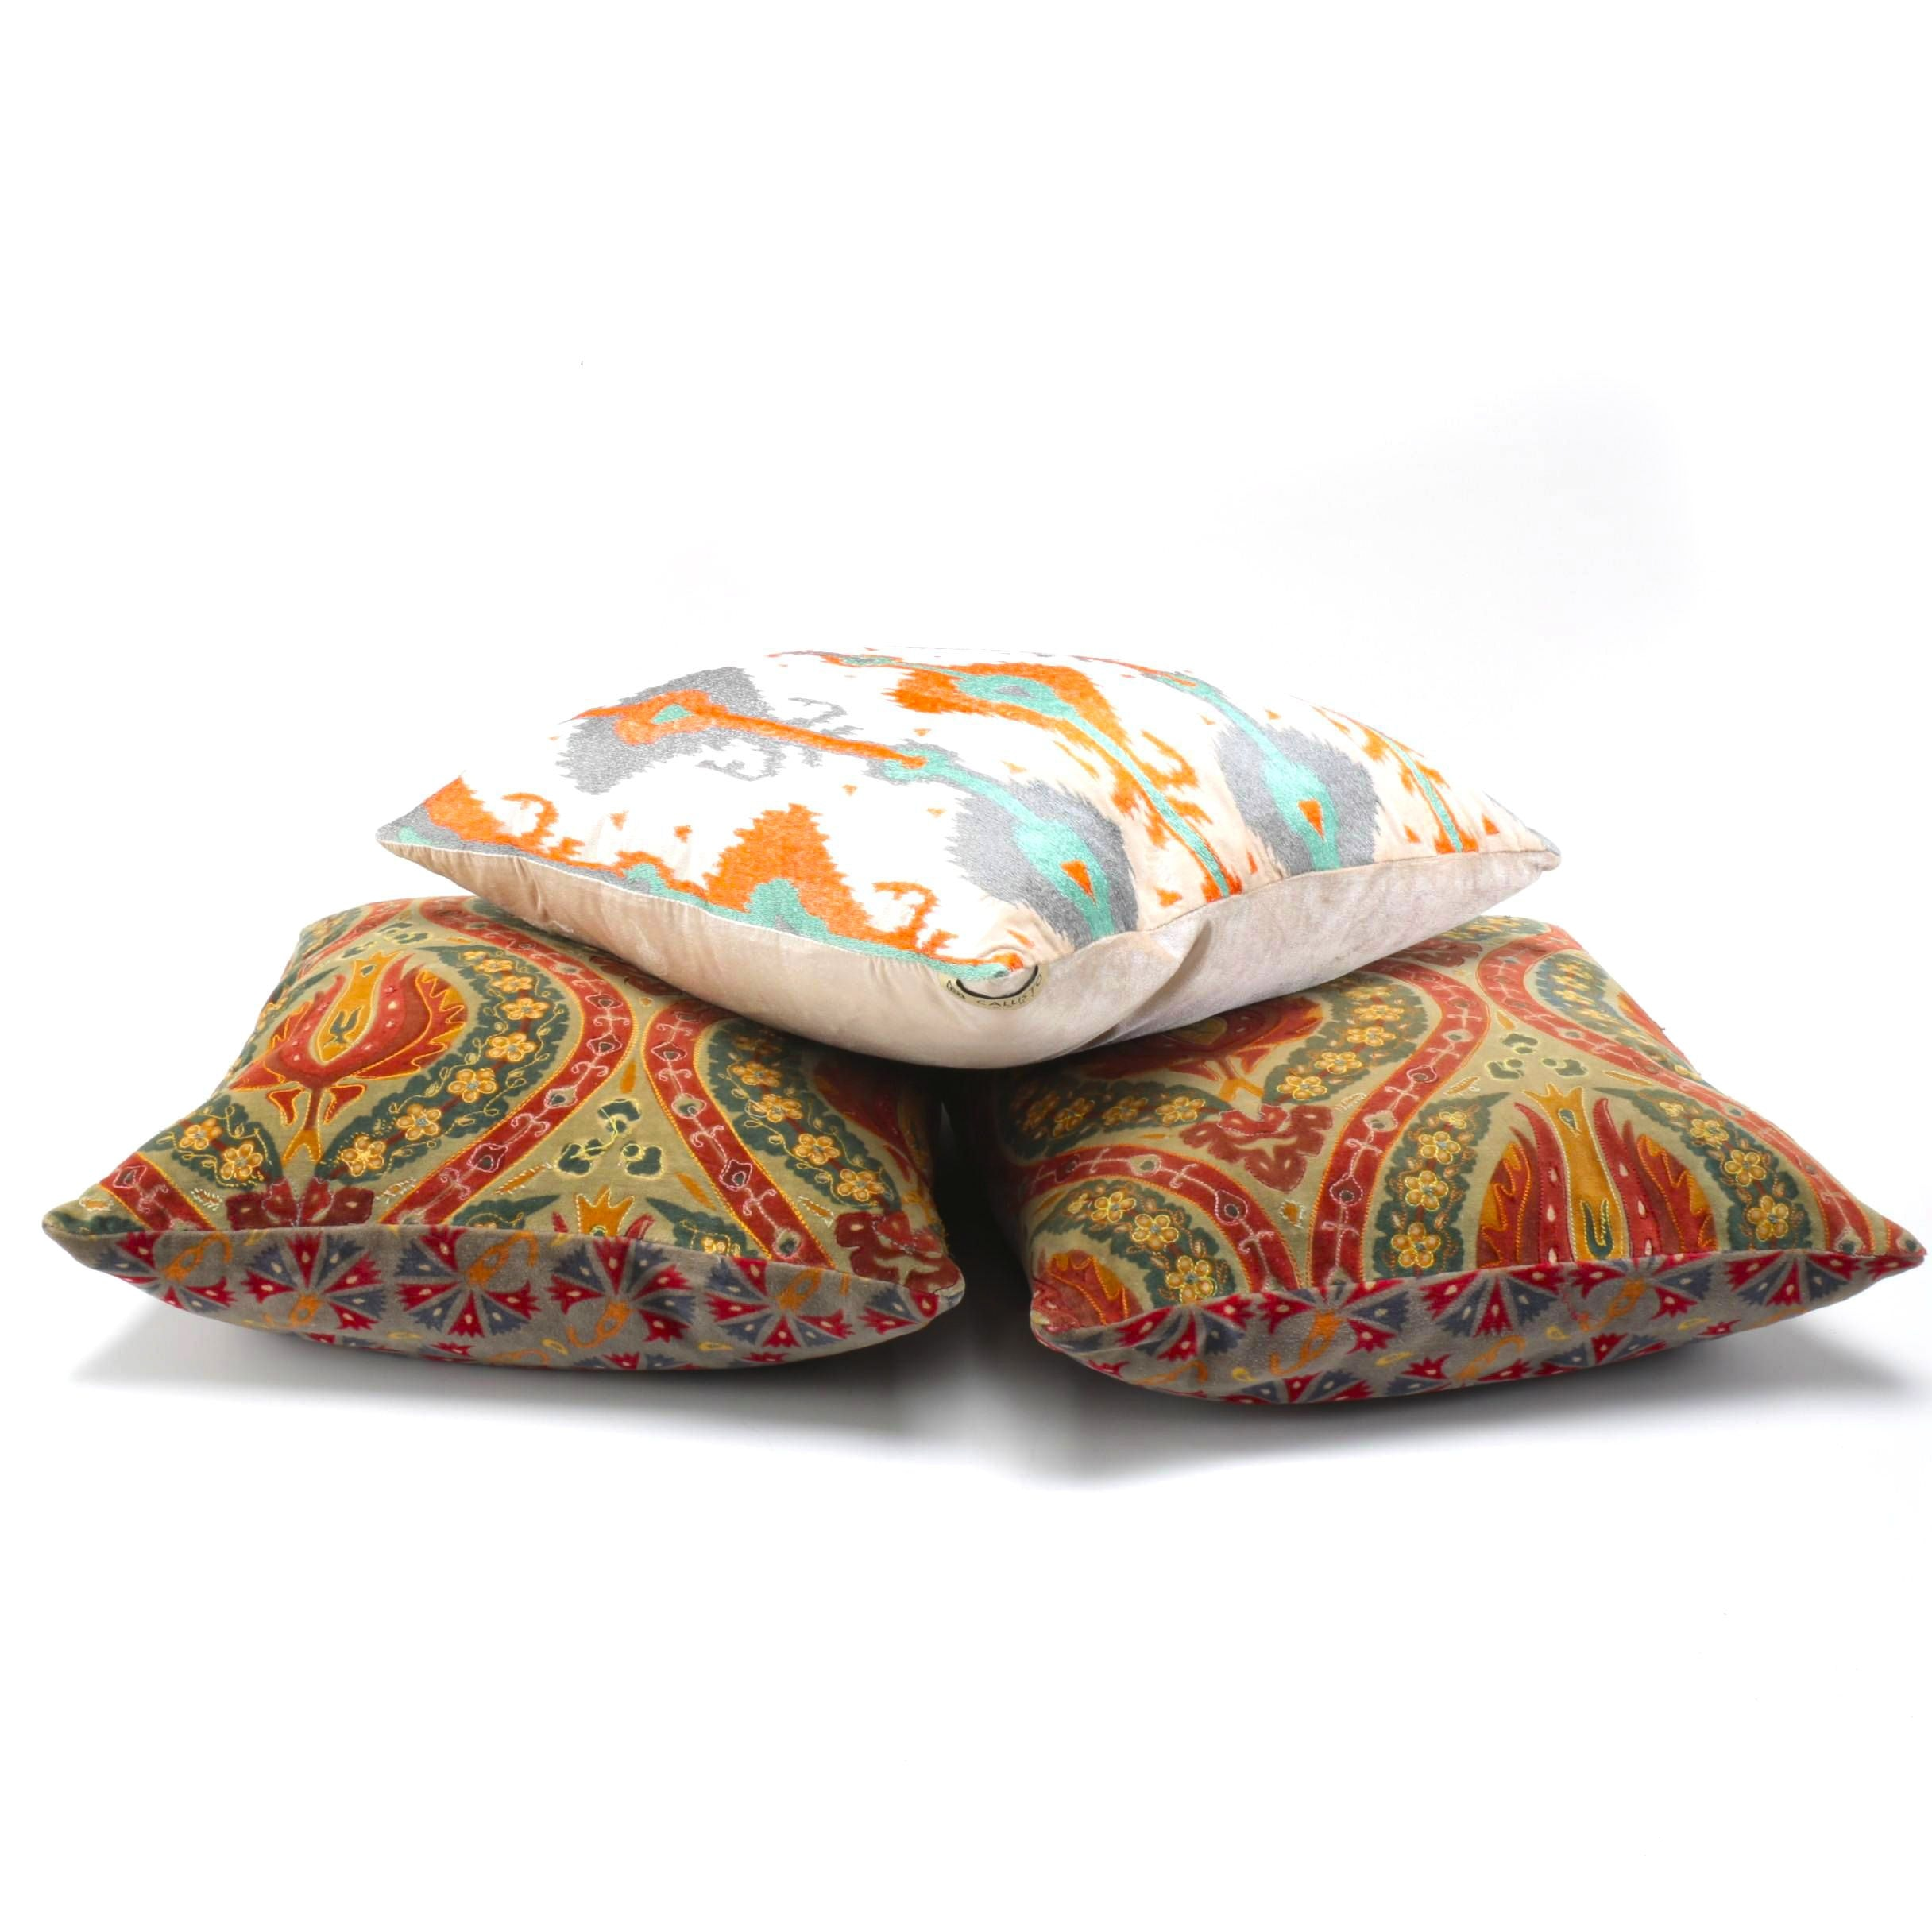 Trio of Decorative Throw Pillows